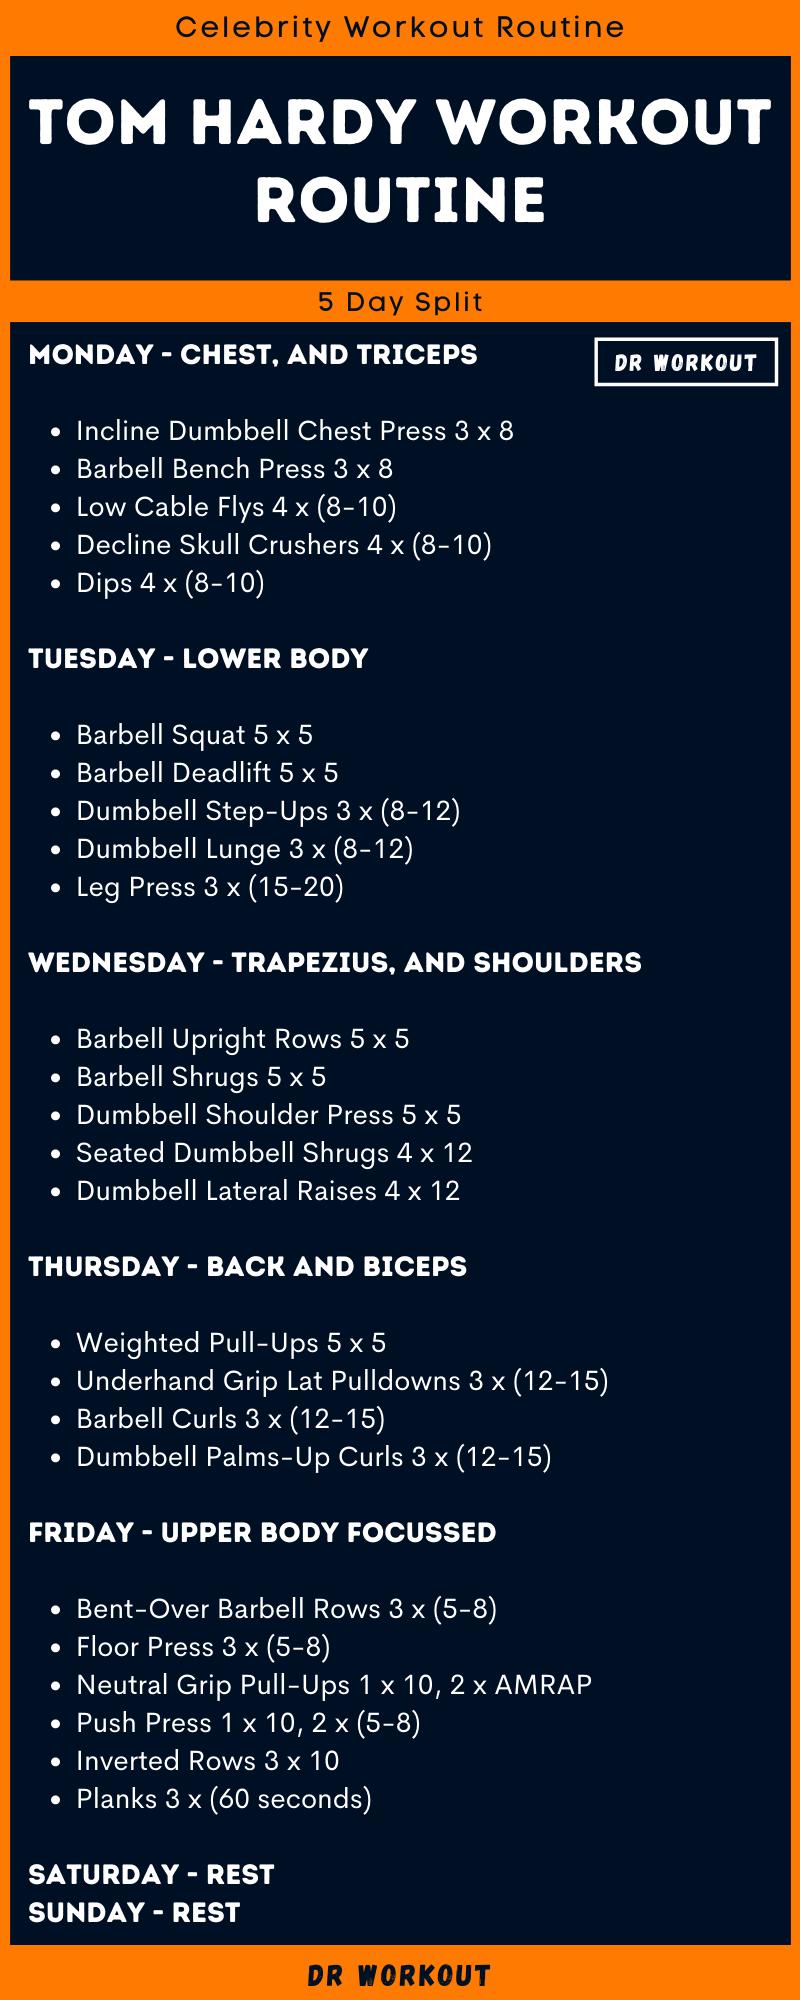 Tom Hardy Workout Routine